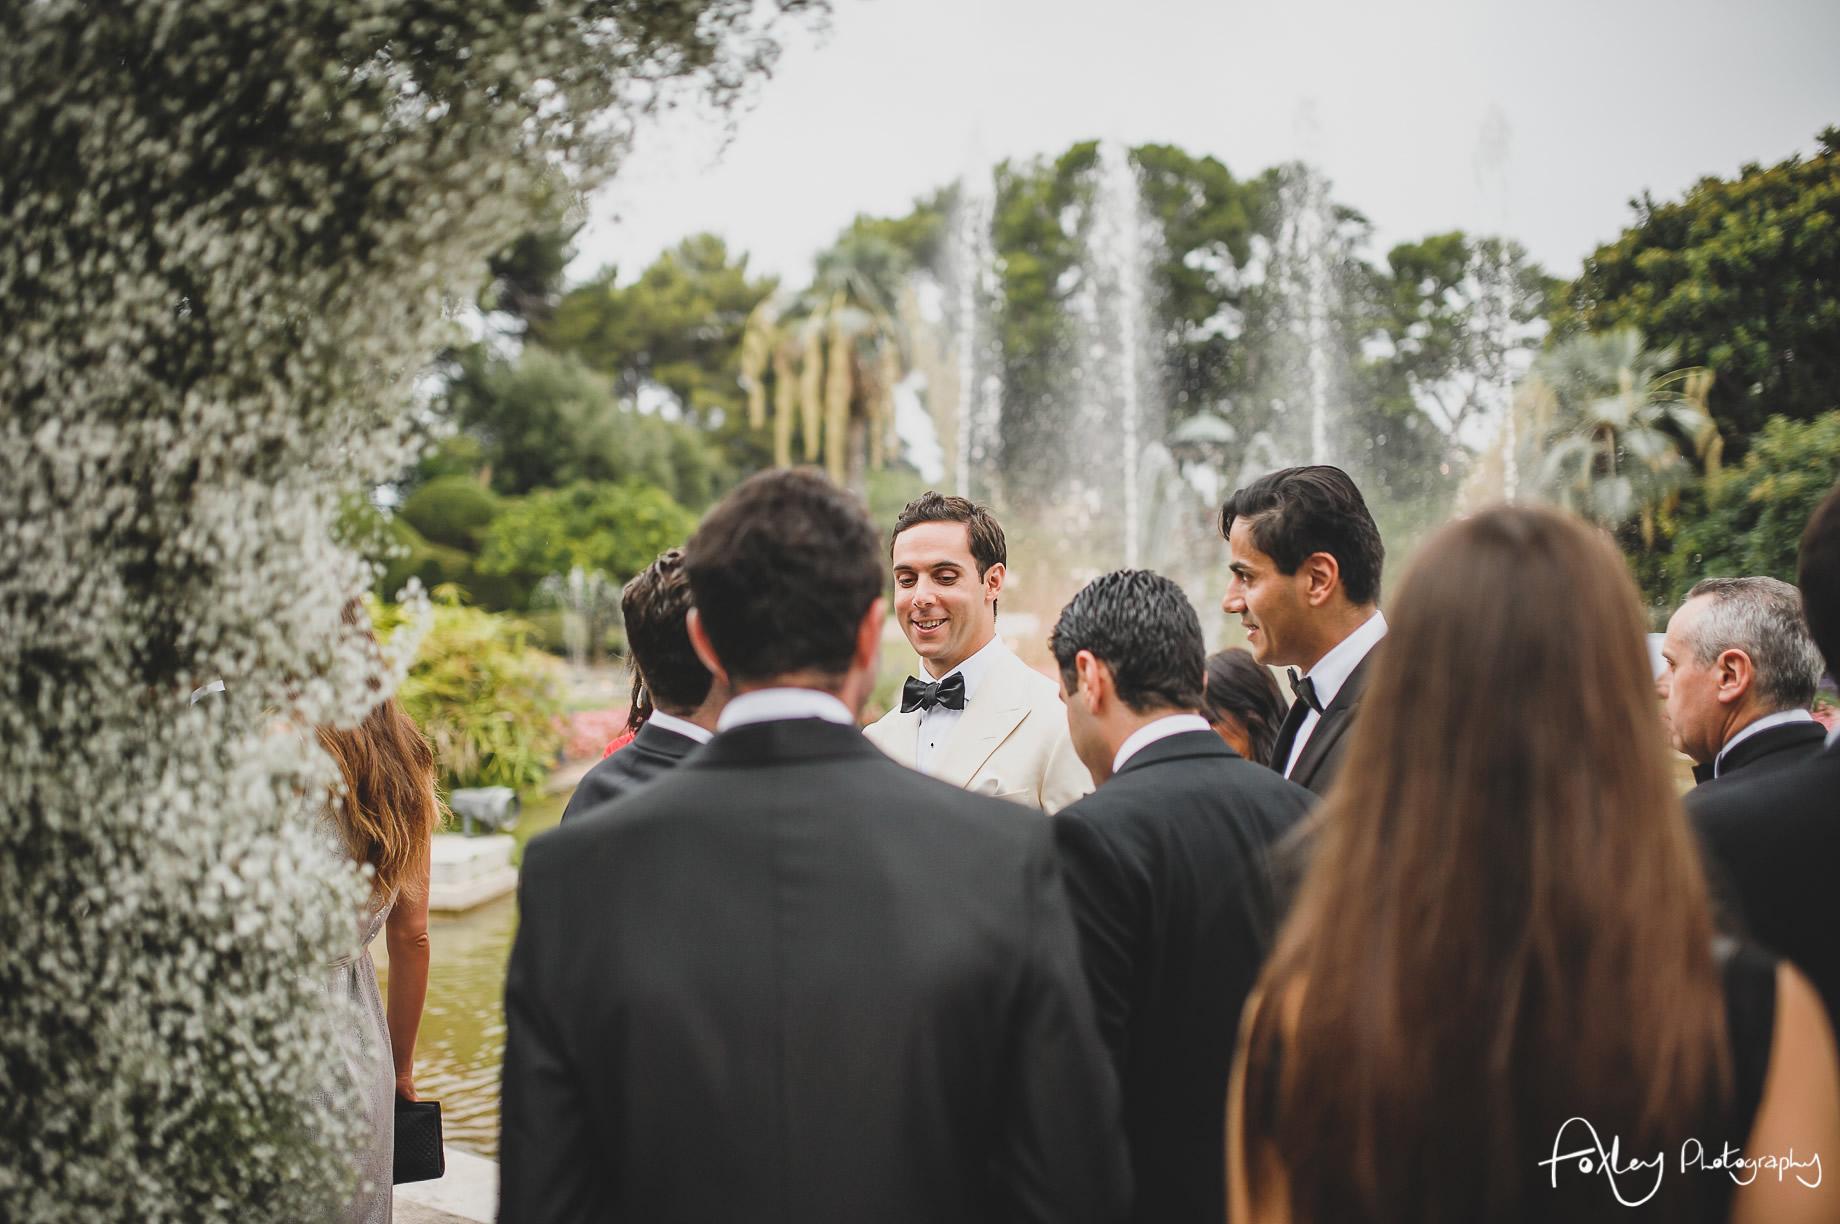 Jil and Will's Wedding at Villa Ephrussi De Rothschild 066